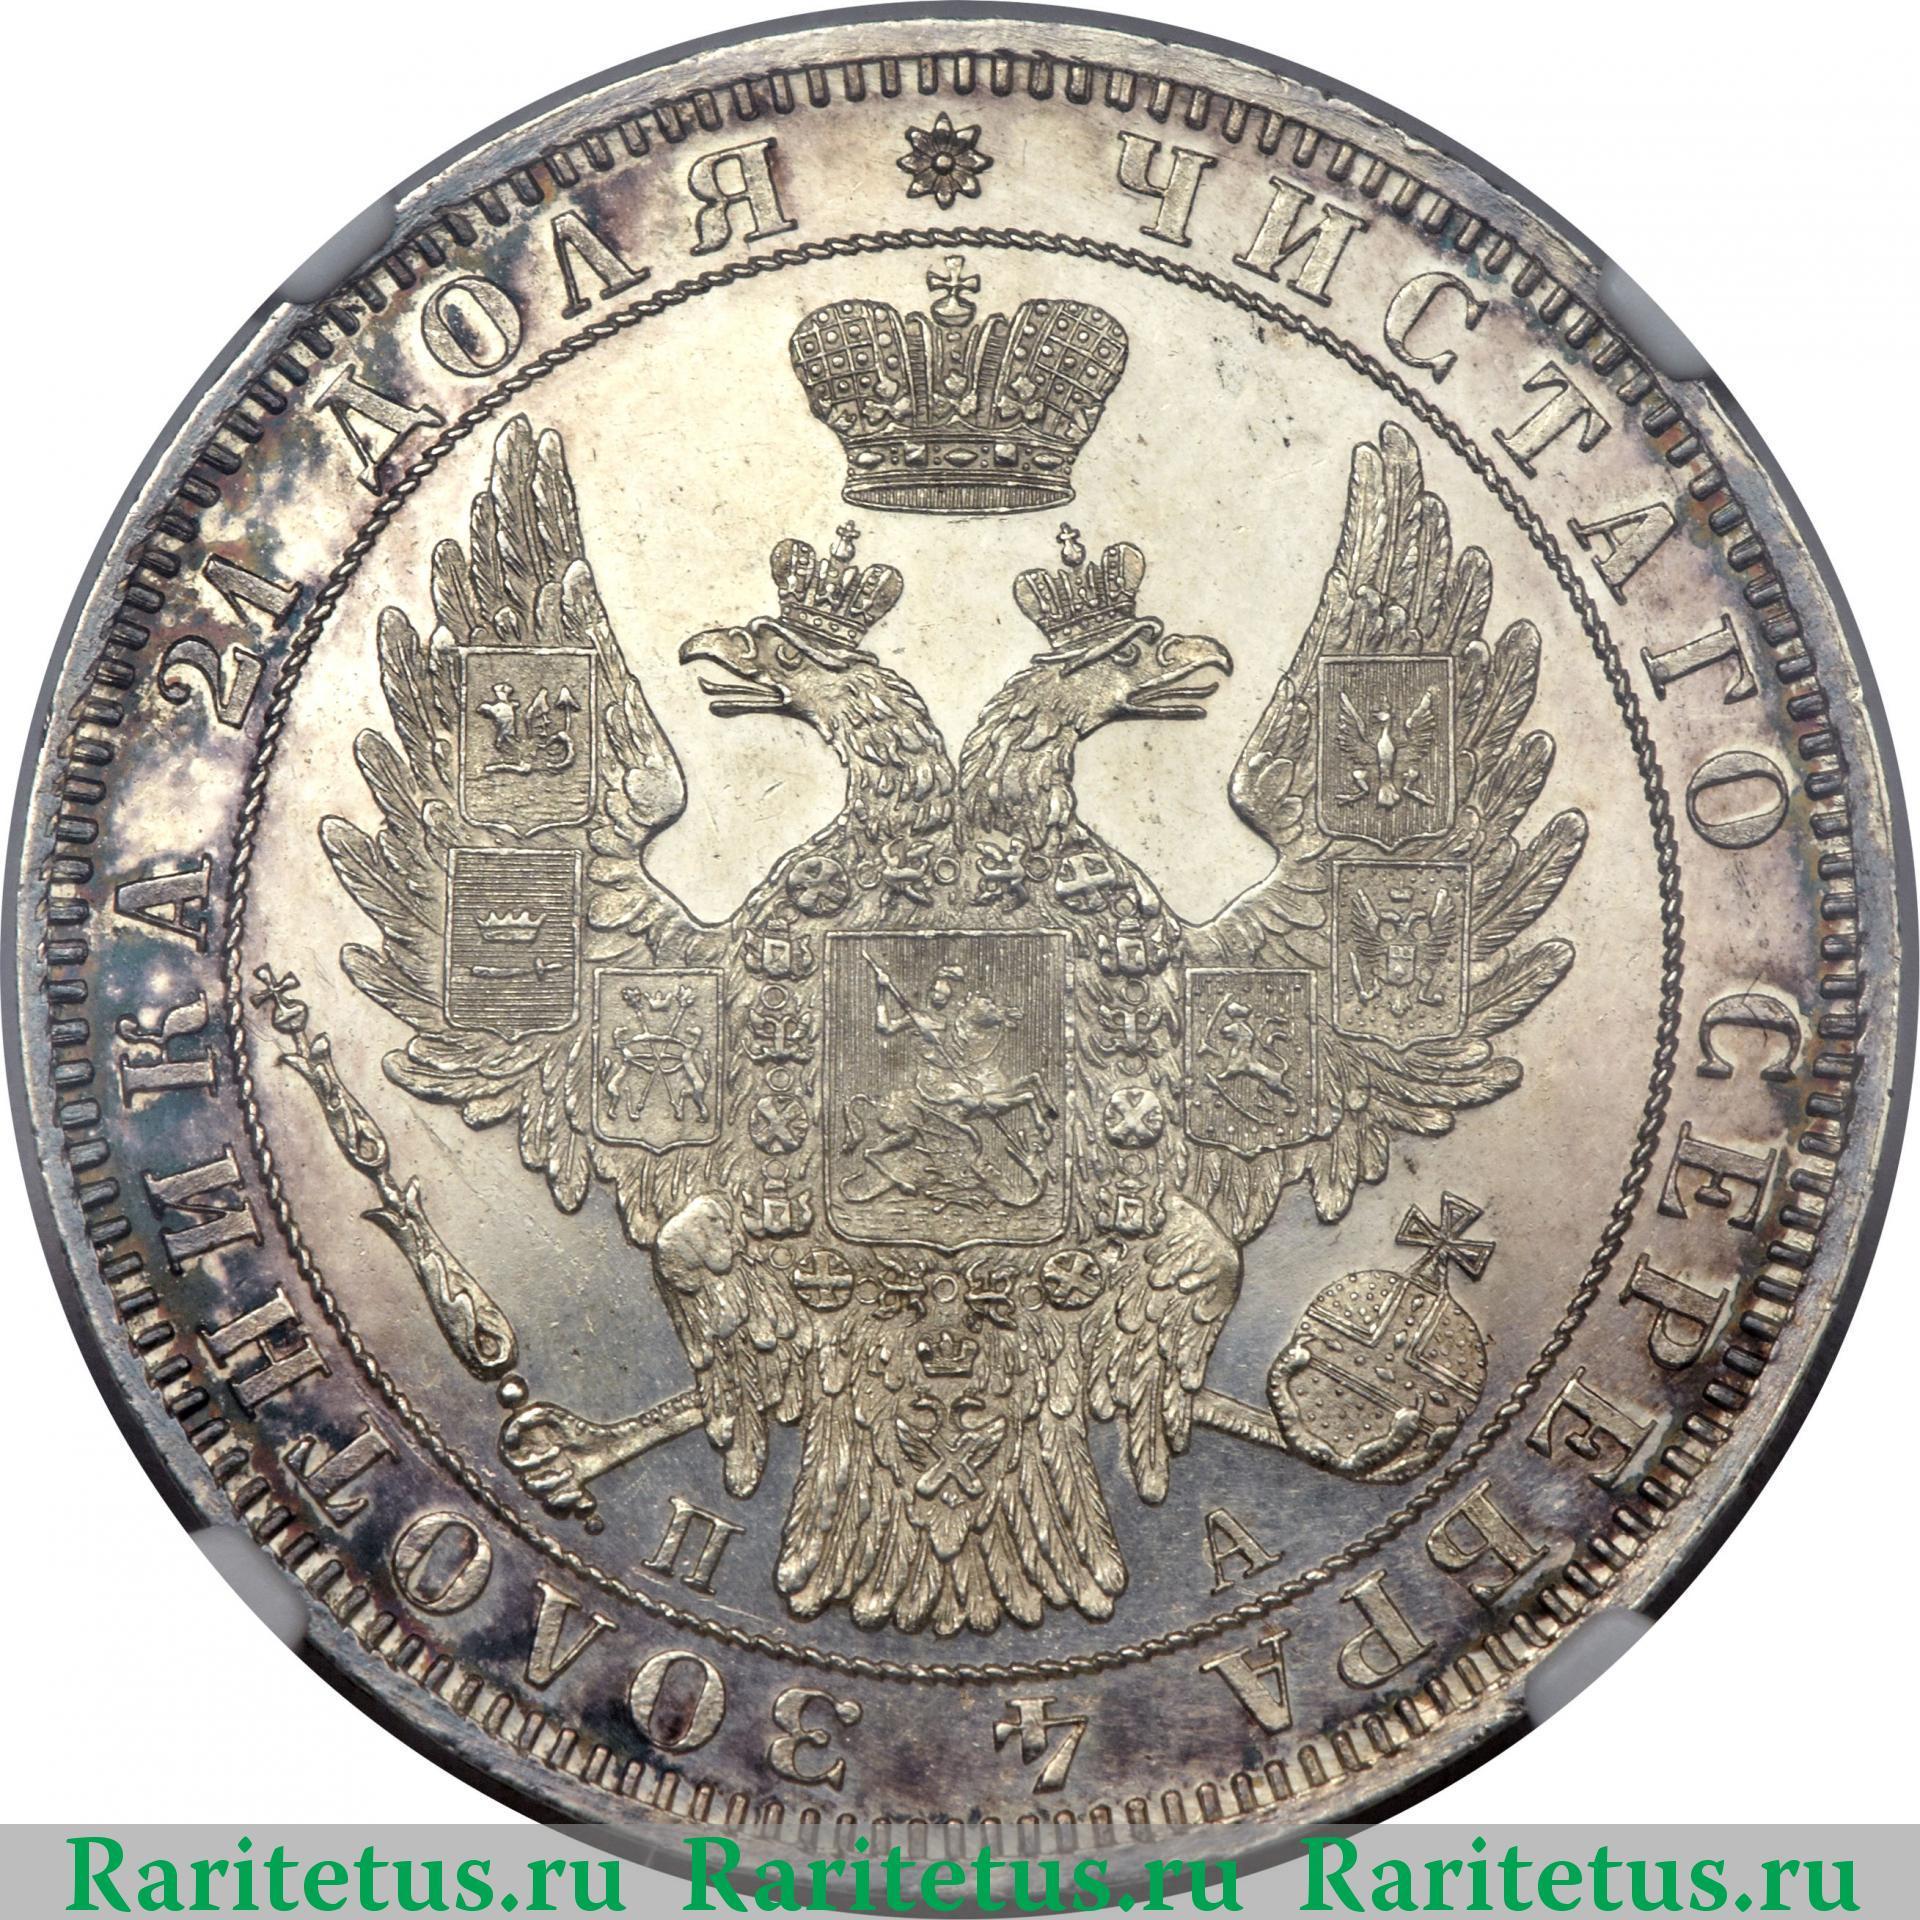 Монета 1849 рубль онлайн оценка старинных монет